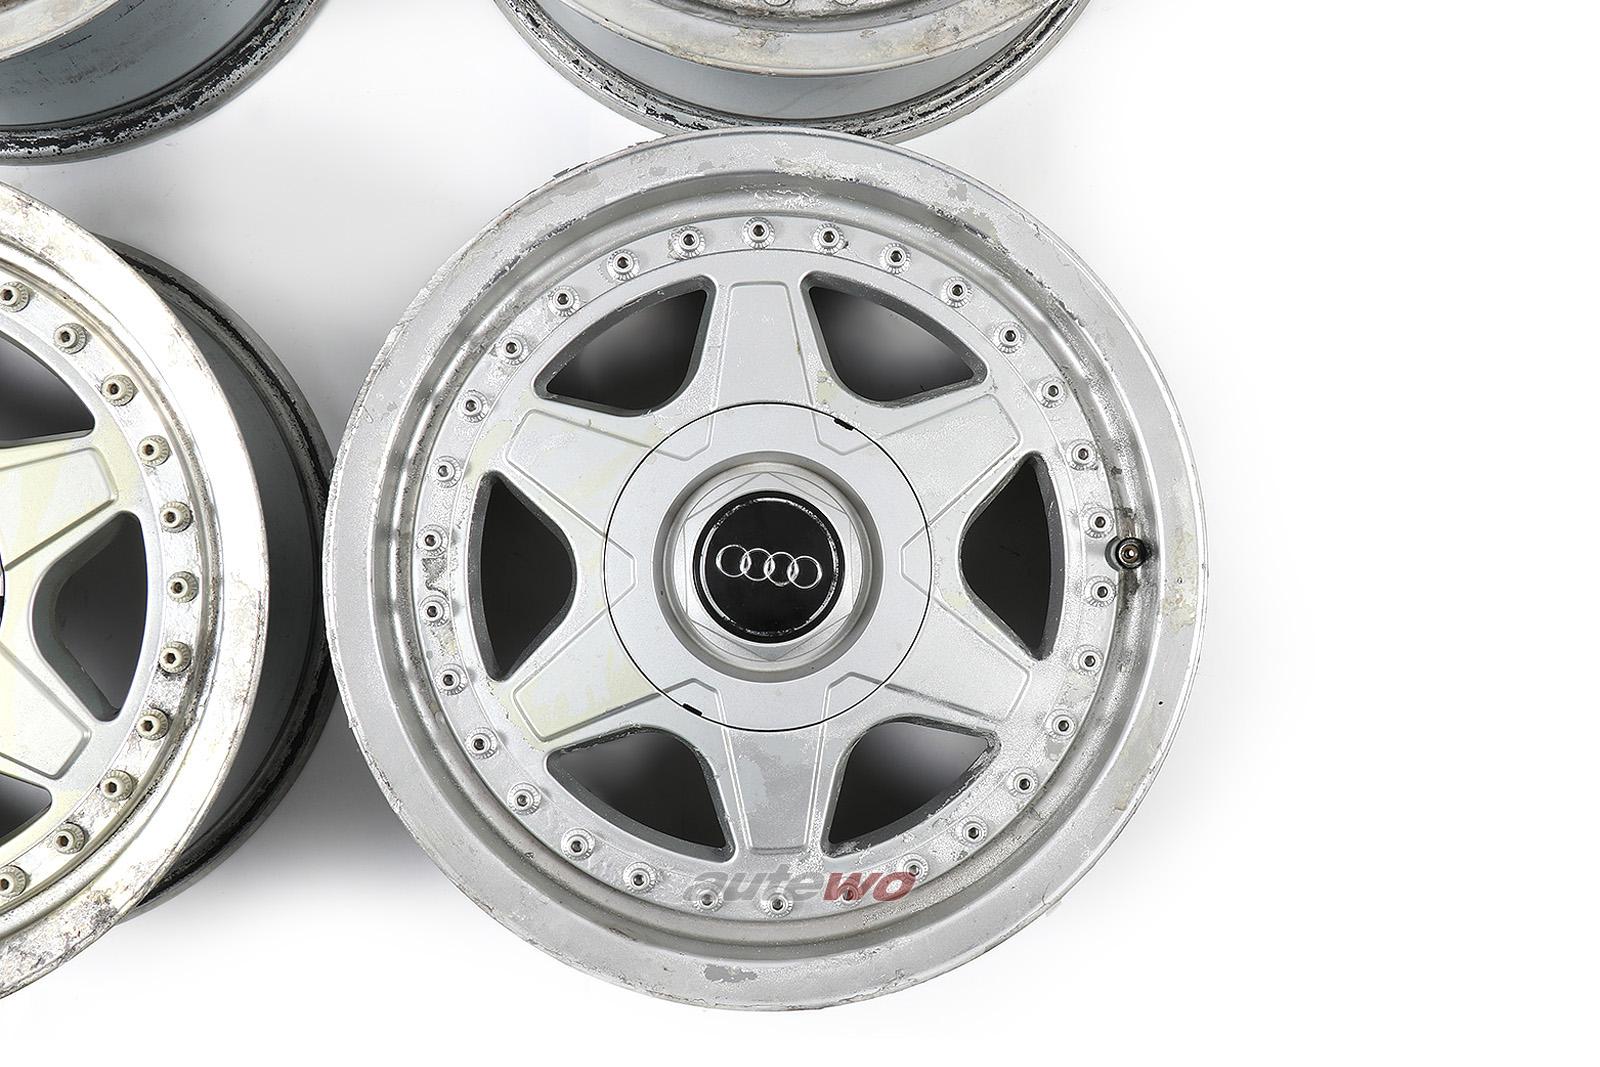 895601025E Audi 80 B4/Coupe/Cabrio 6-Speichen Speedline Alufelgensatz 7x15 ET37